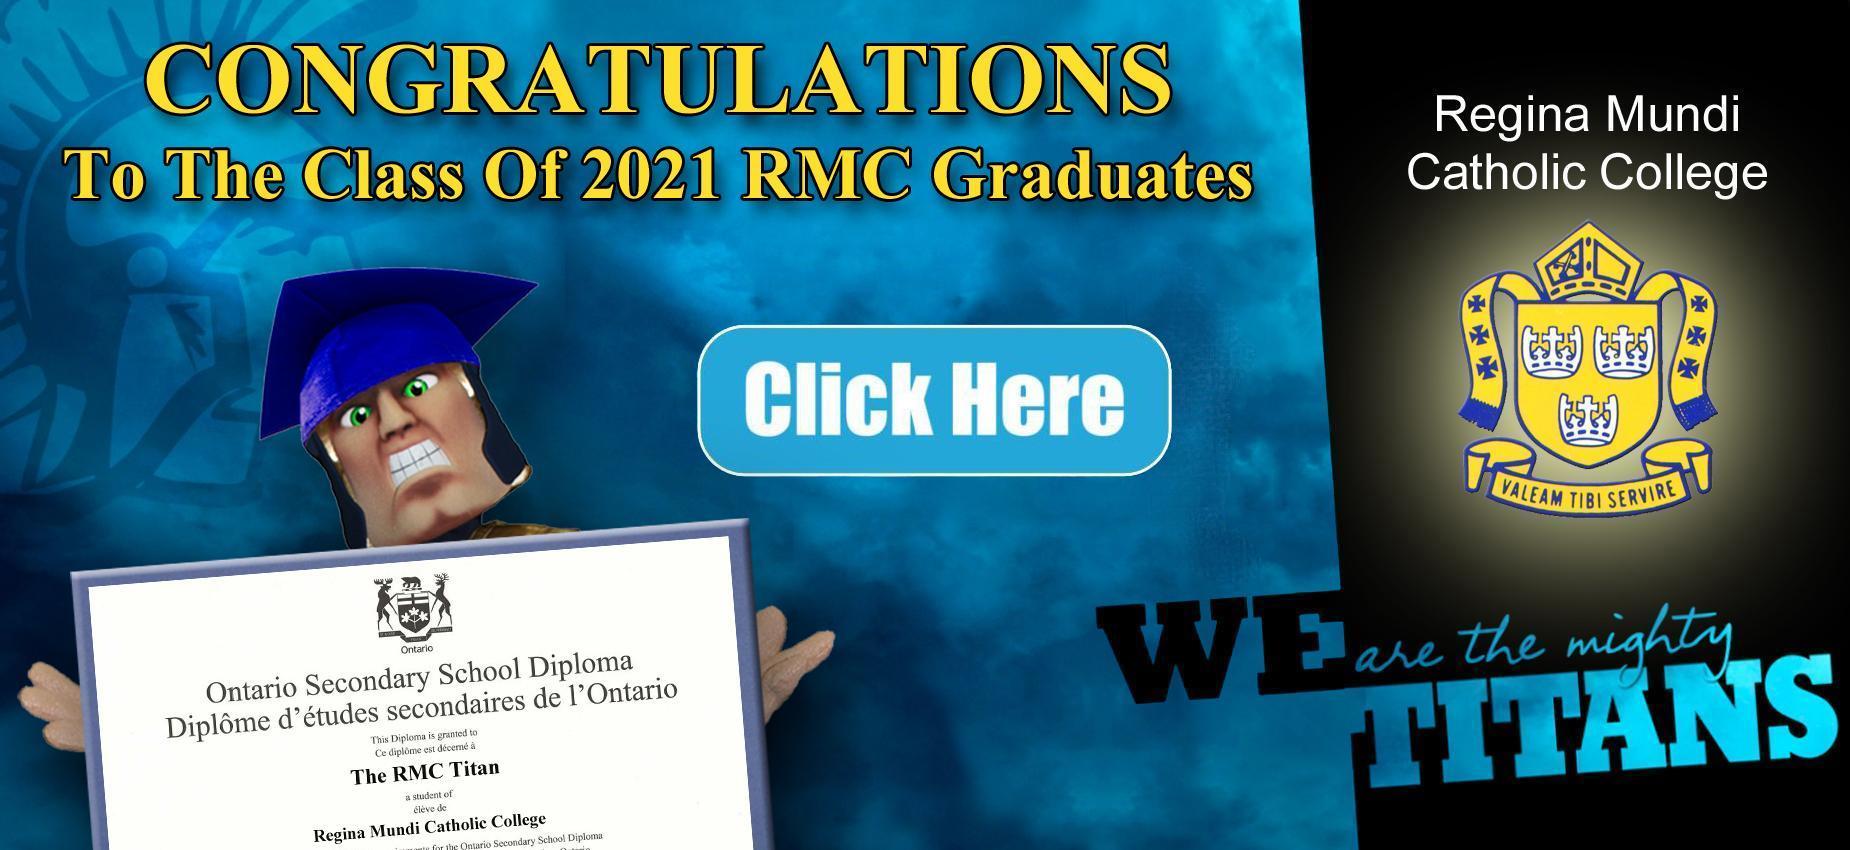 Class of 2021 RMC Graduates